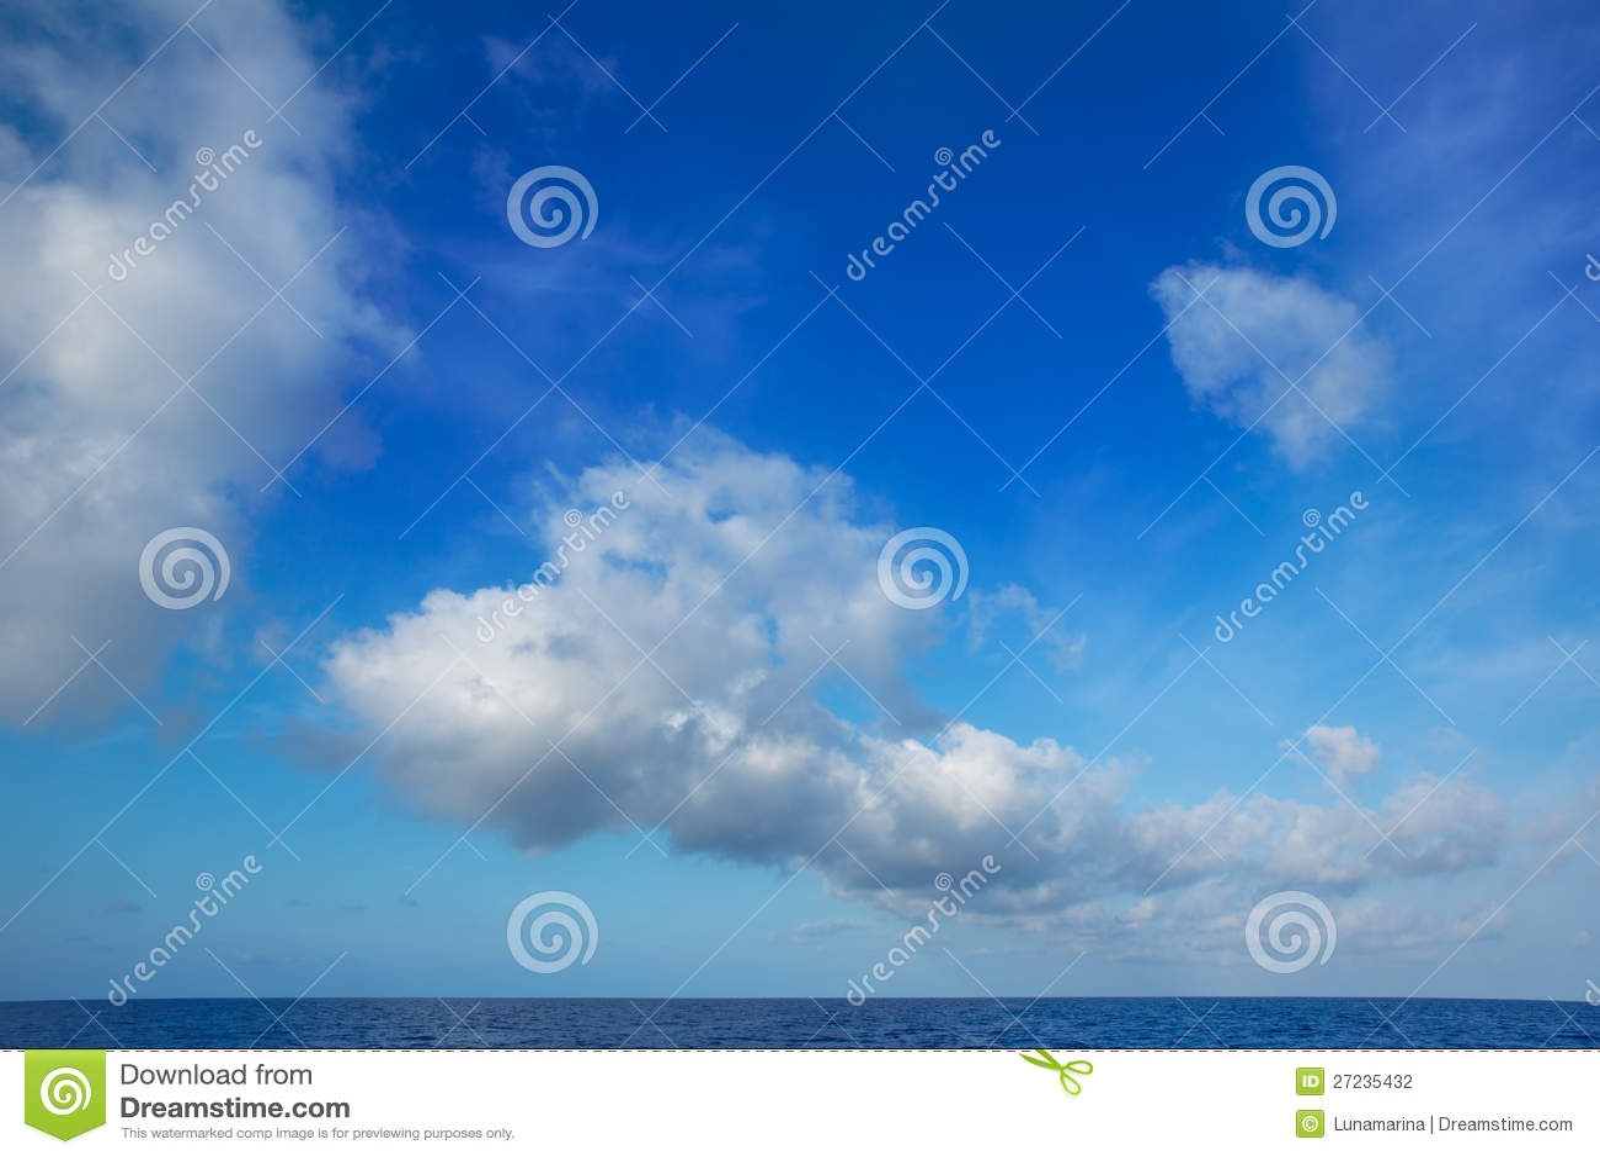 Cumulus chmury w niebieskim niebie nad wodnym horyzontem